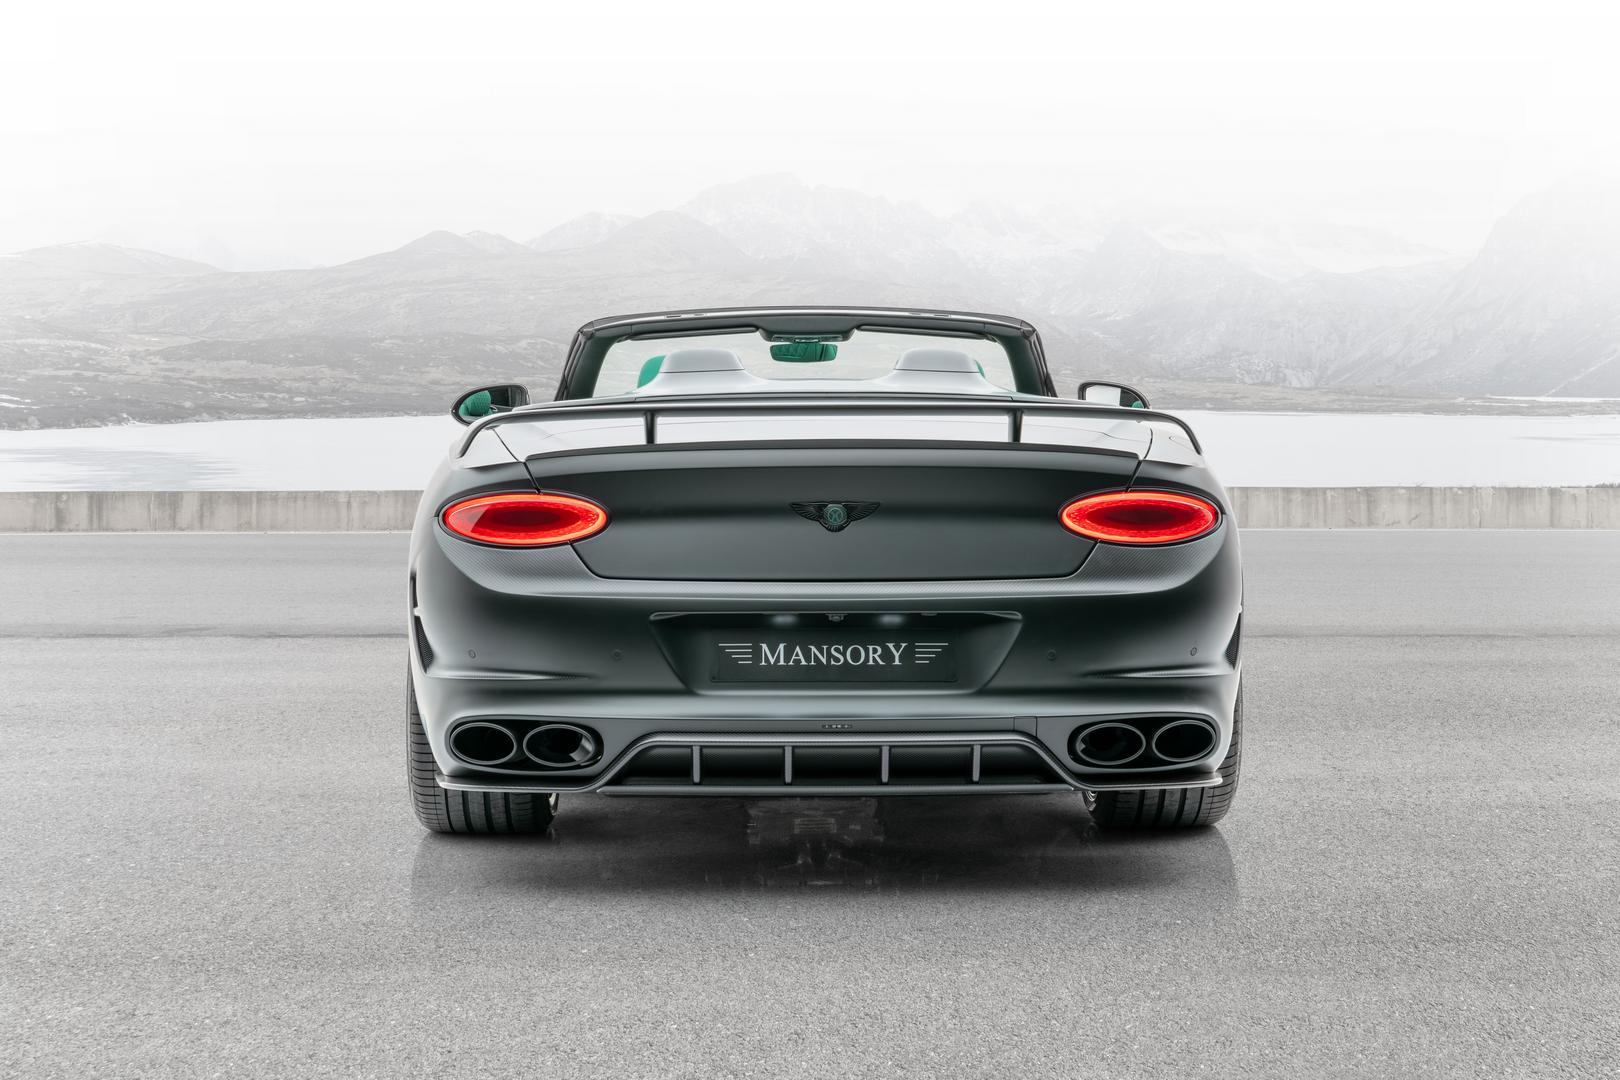 Mansory Bentley Bentayga GTC V8 Rear Lights